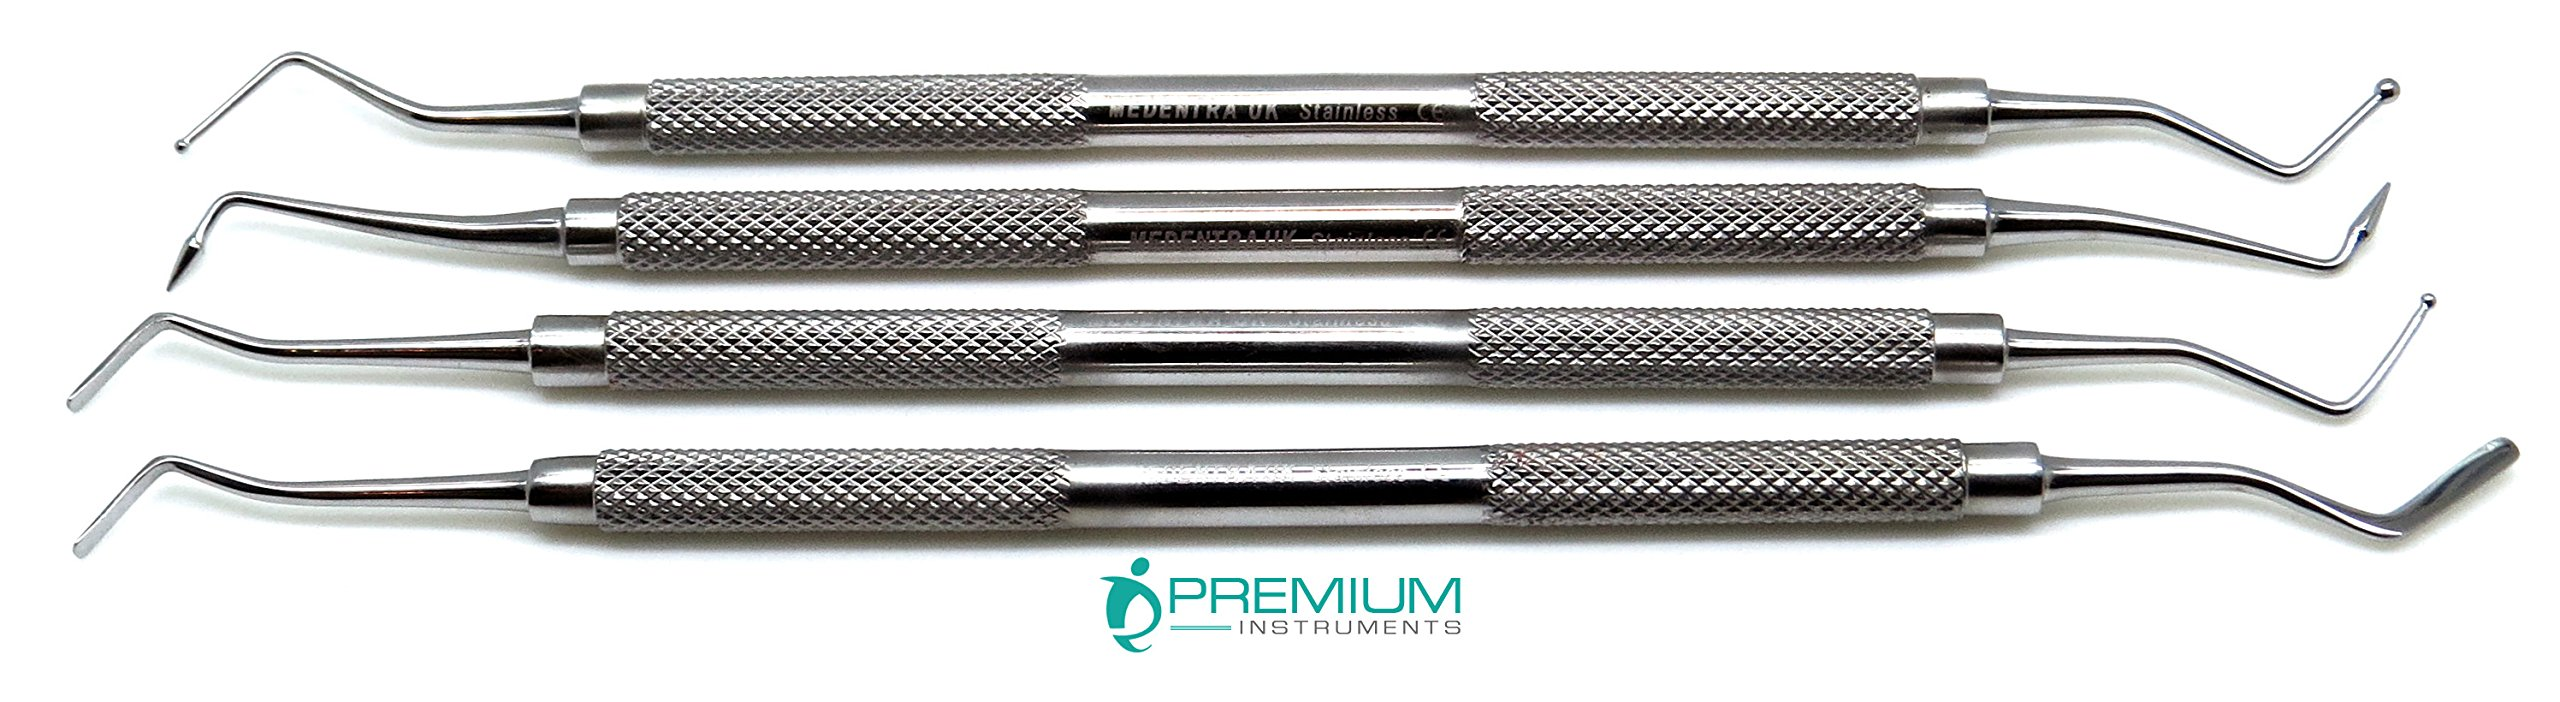 Composite Filling Set of 4 Dental Restorative Premium Instrument